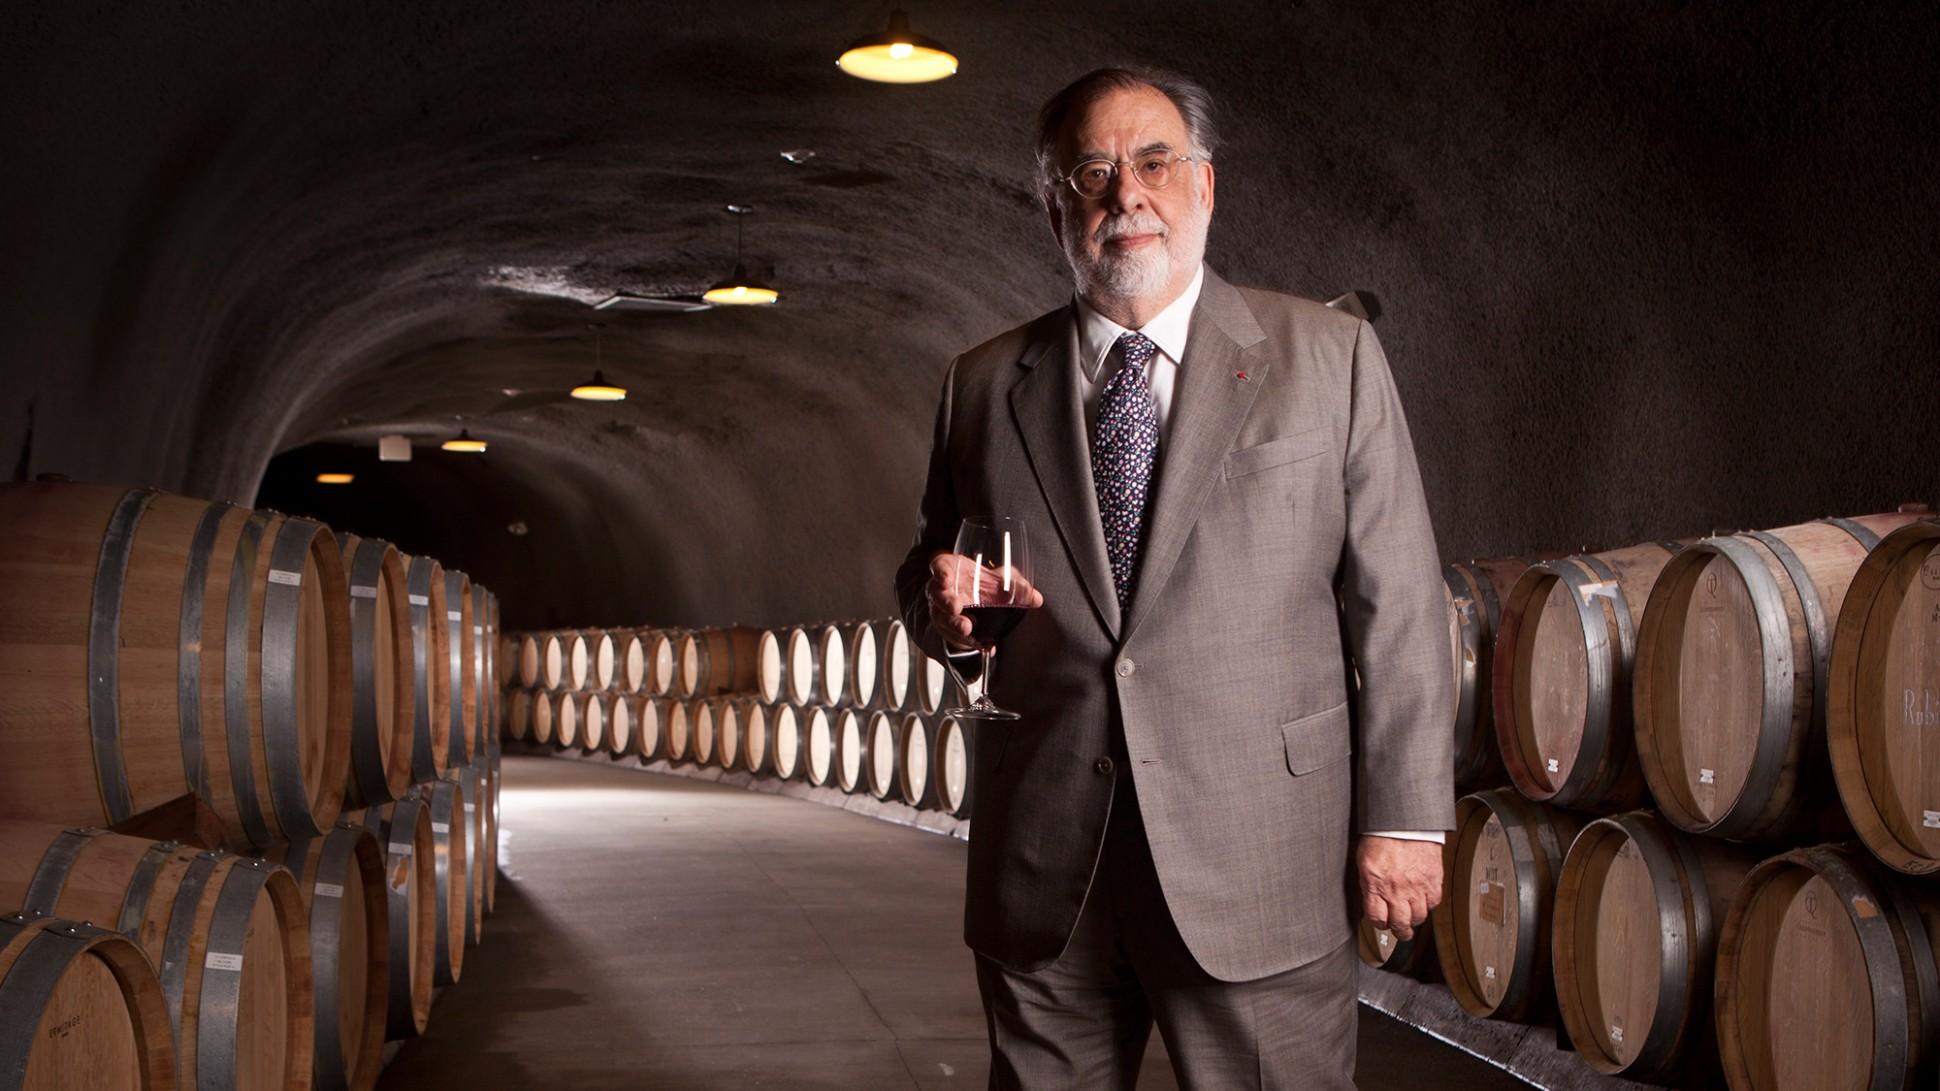 1021_FL-francis-ford-coppola-wine_2000x1125-1940x1091